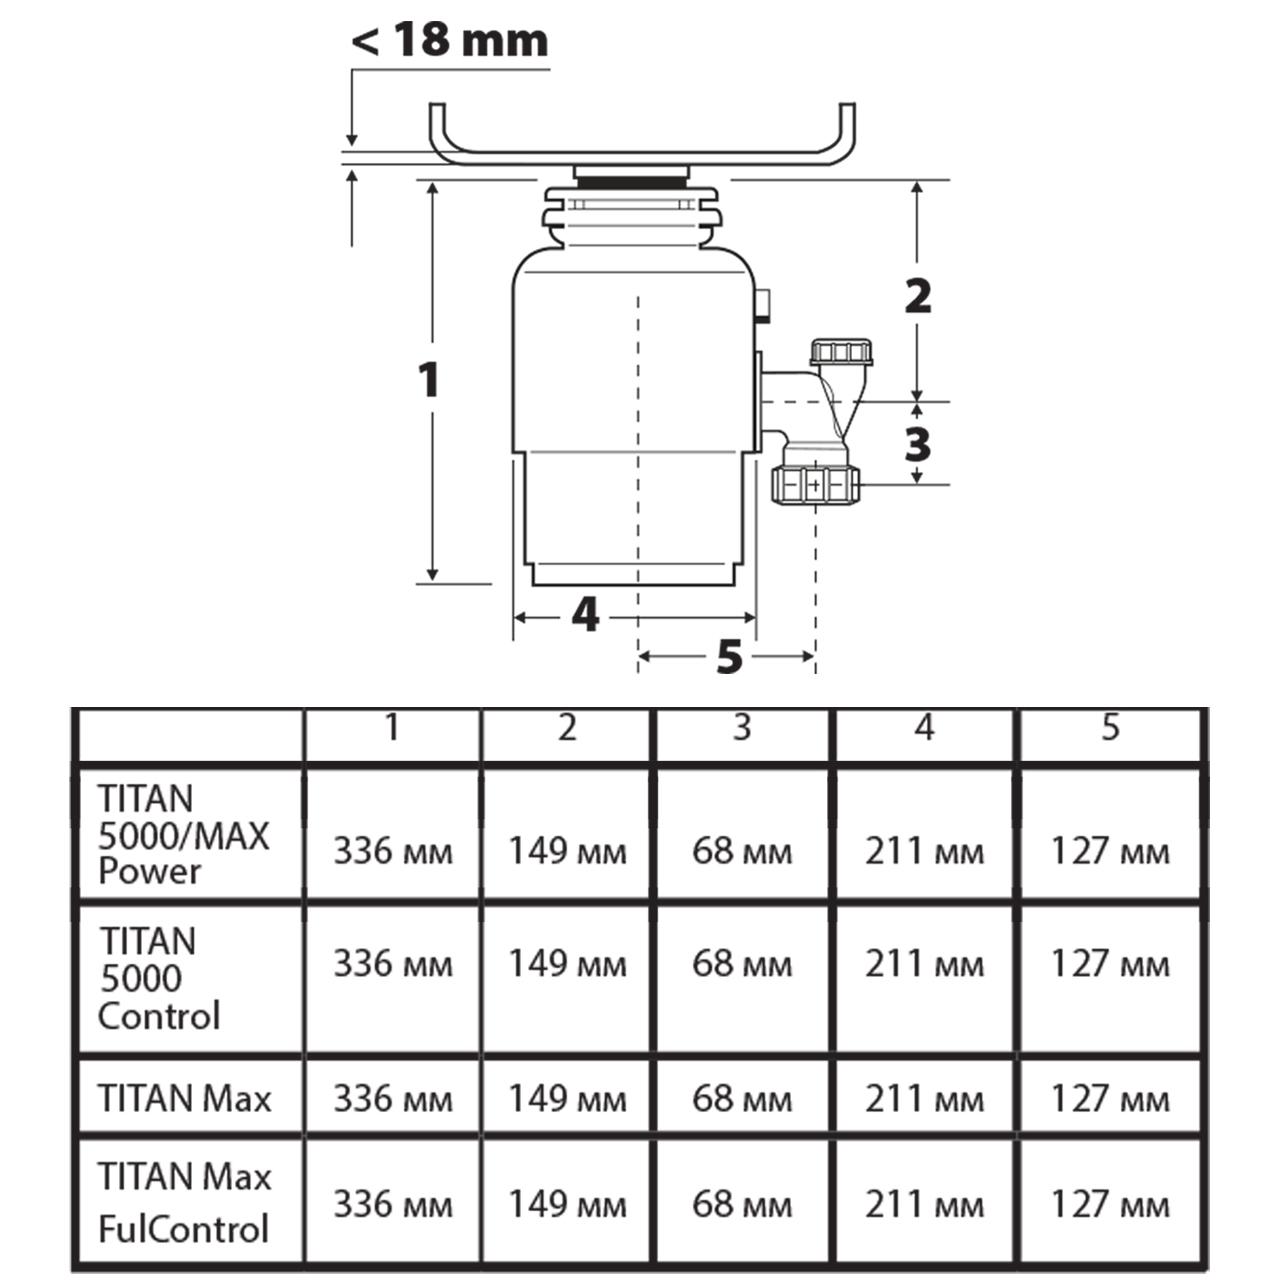 Trituradora Titan Max Power (full control)